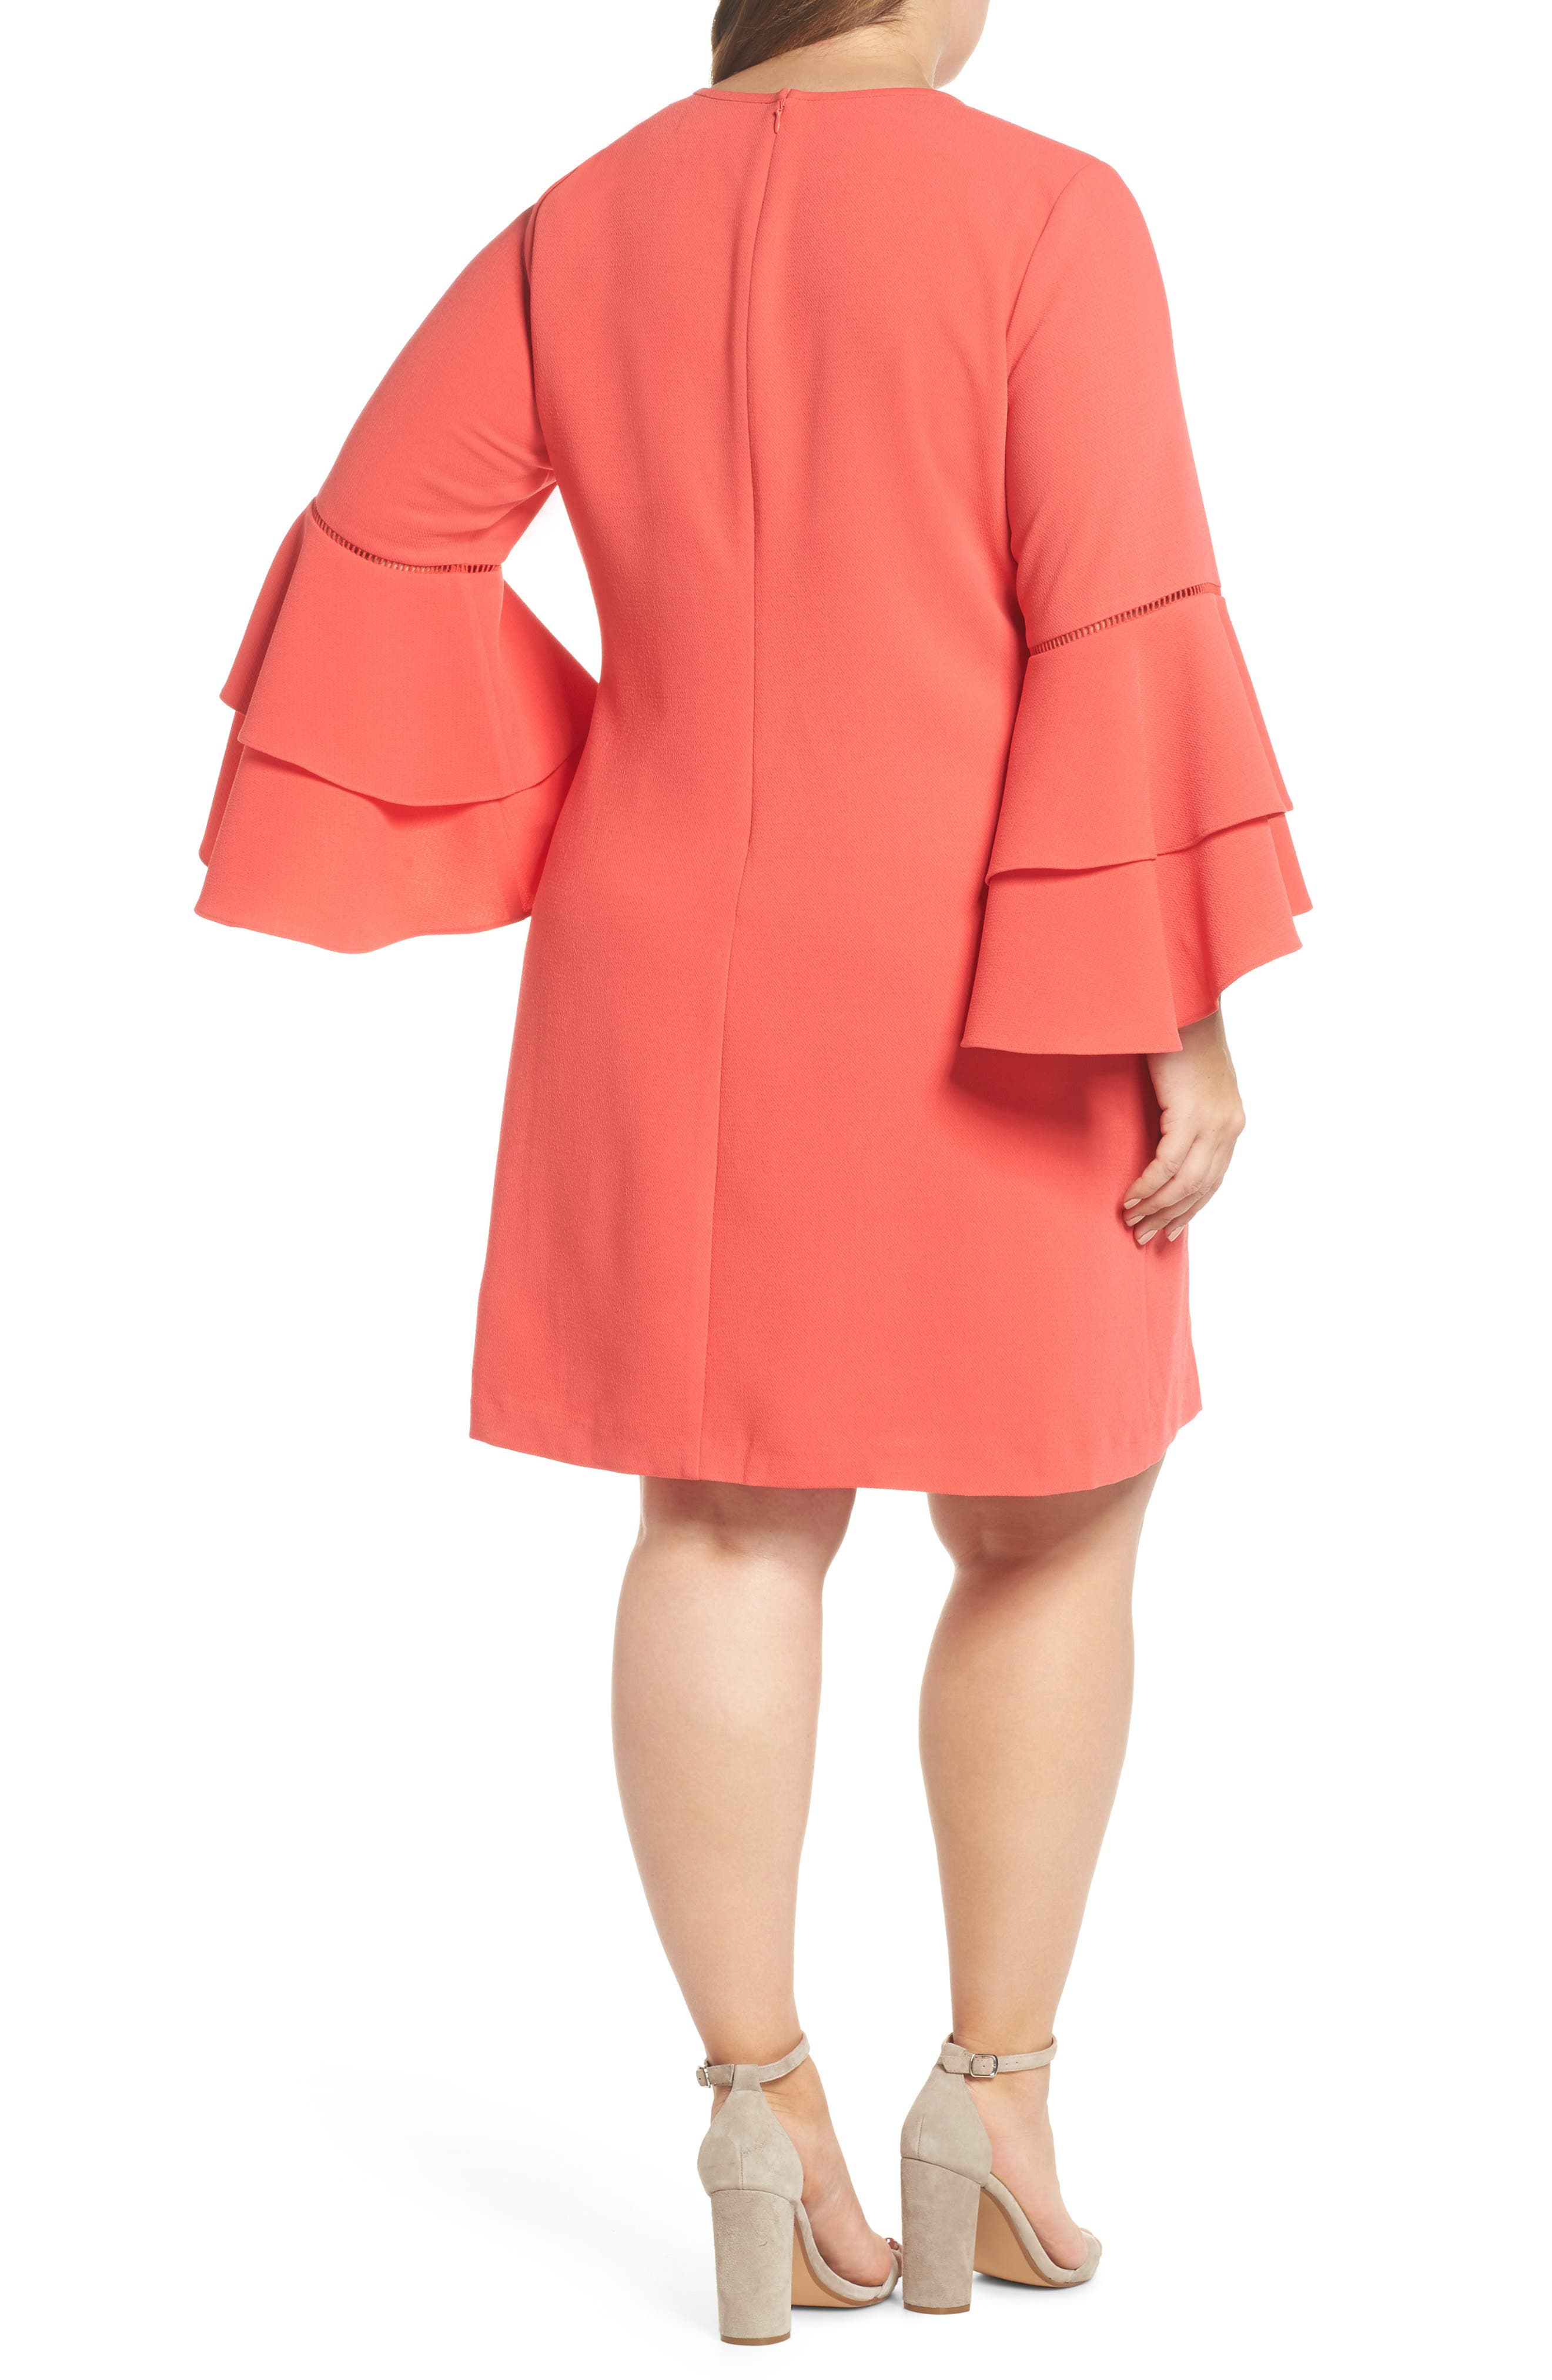 Alternate Image 2  - Chelsea28 Ruffle Bell Sleeve Shift Dress (Plus Size)